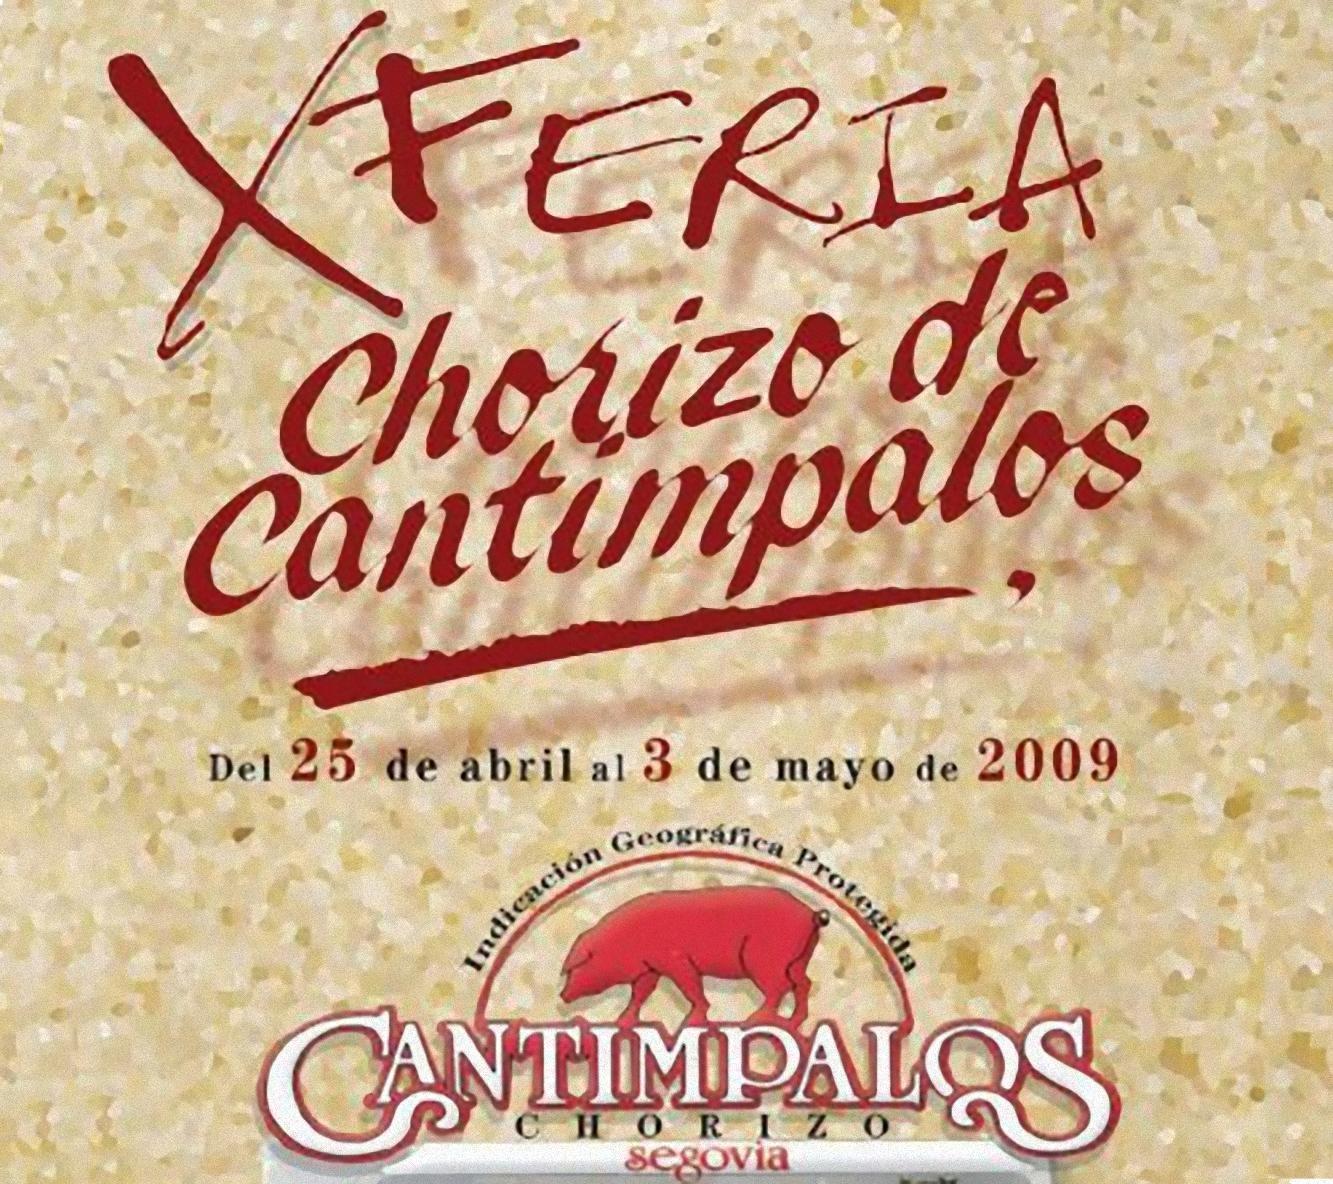 Cartel de la X Feria del Chorizo de Cantimpalos